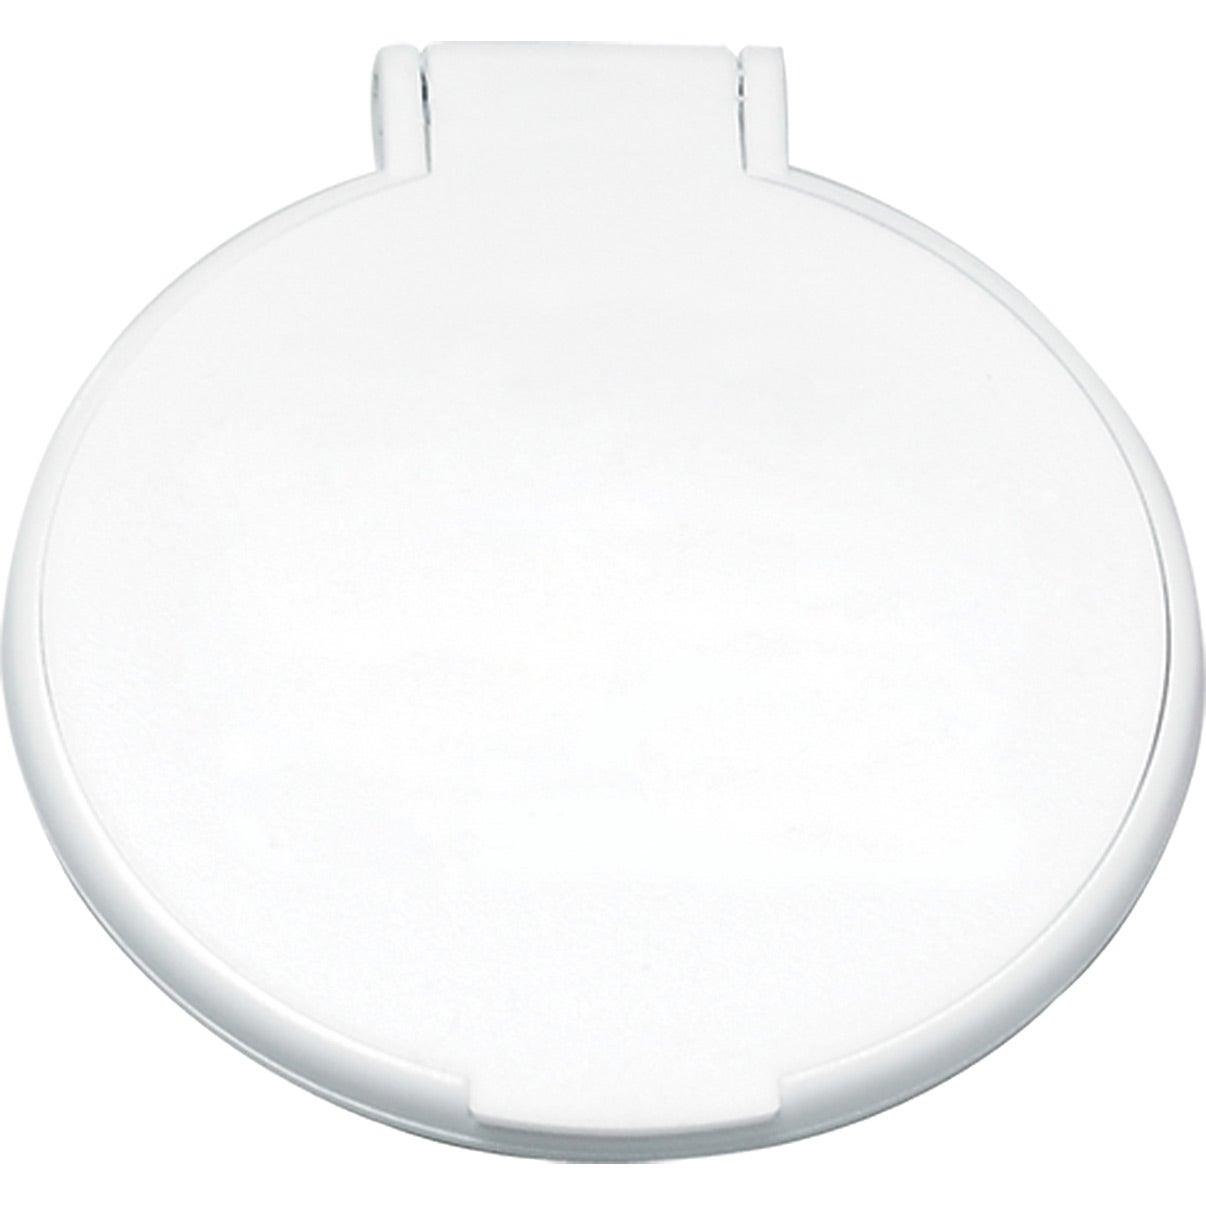 Compact Round Mirrors